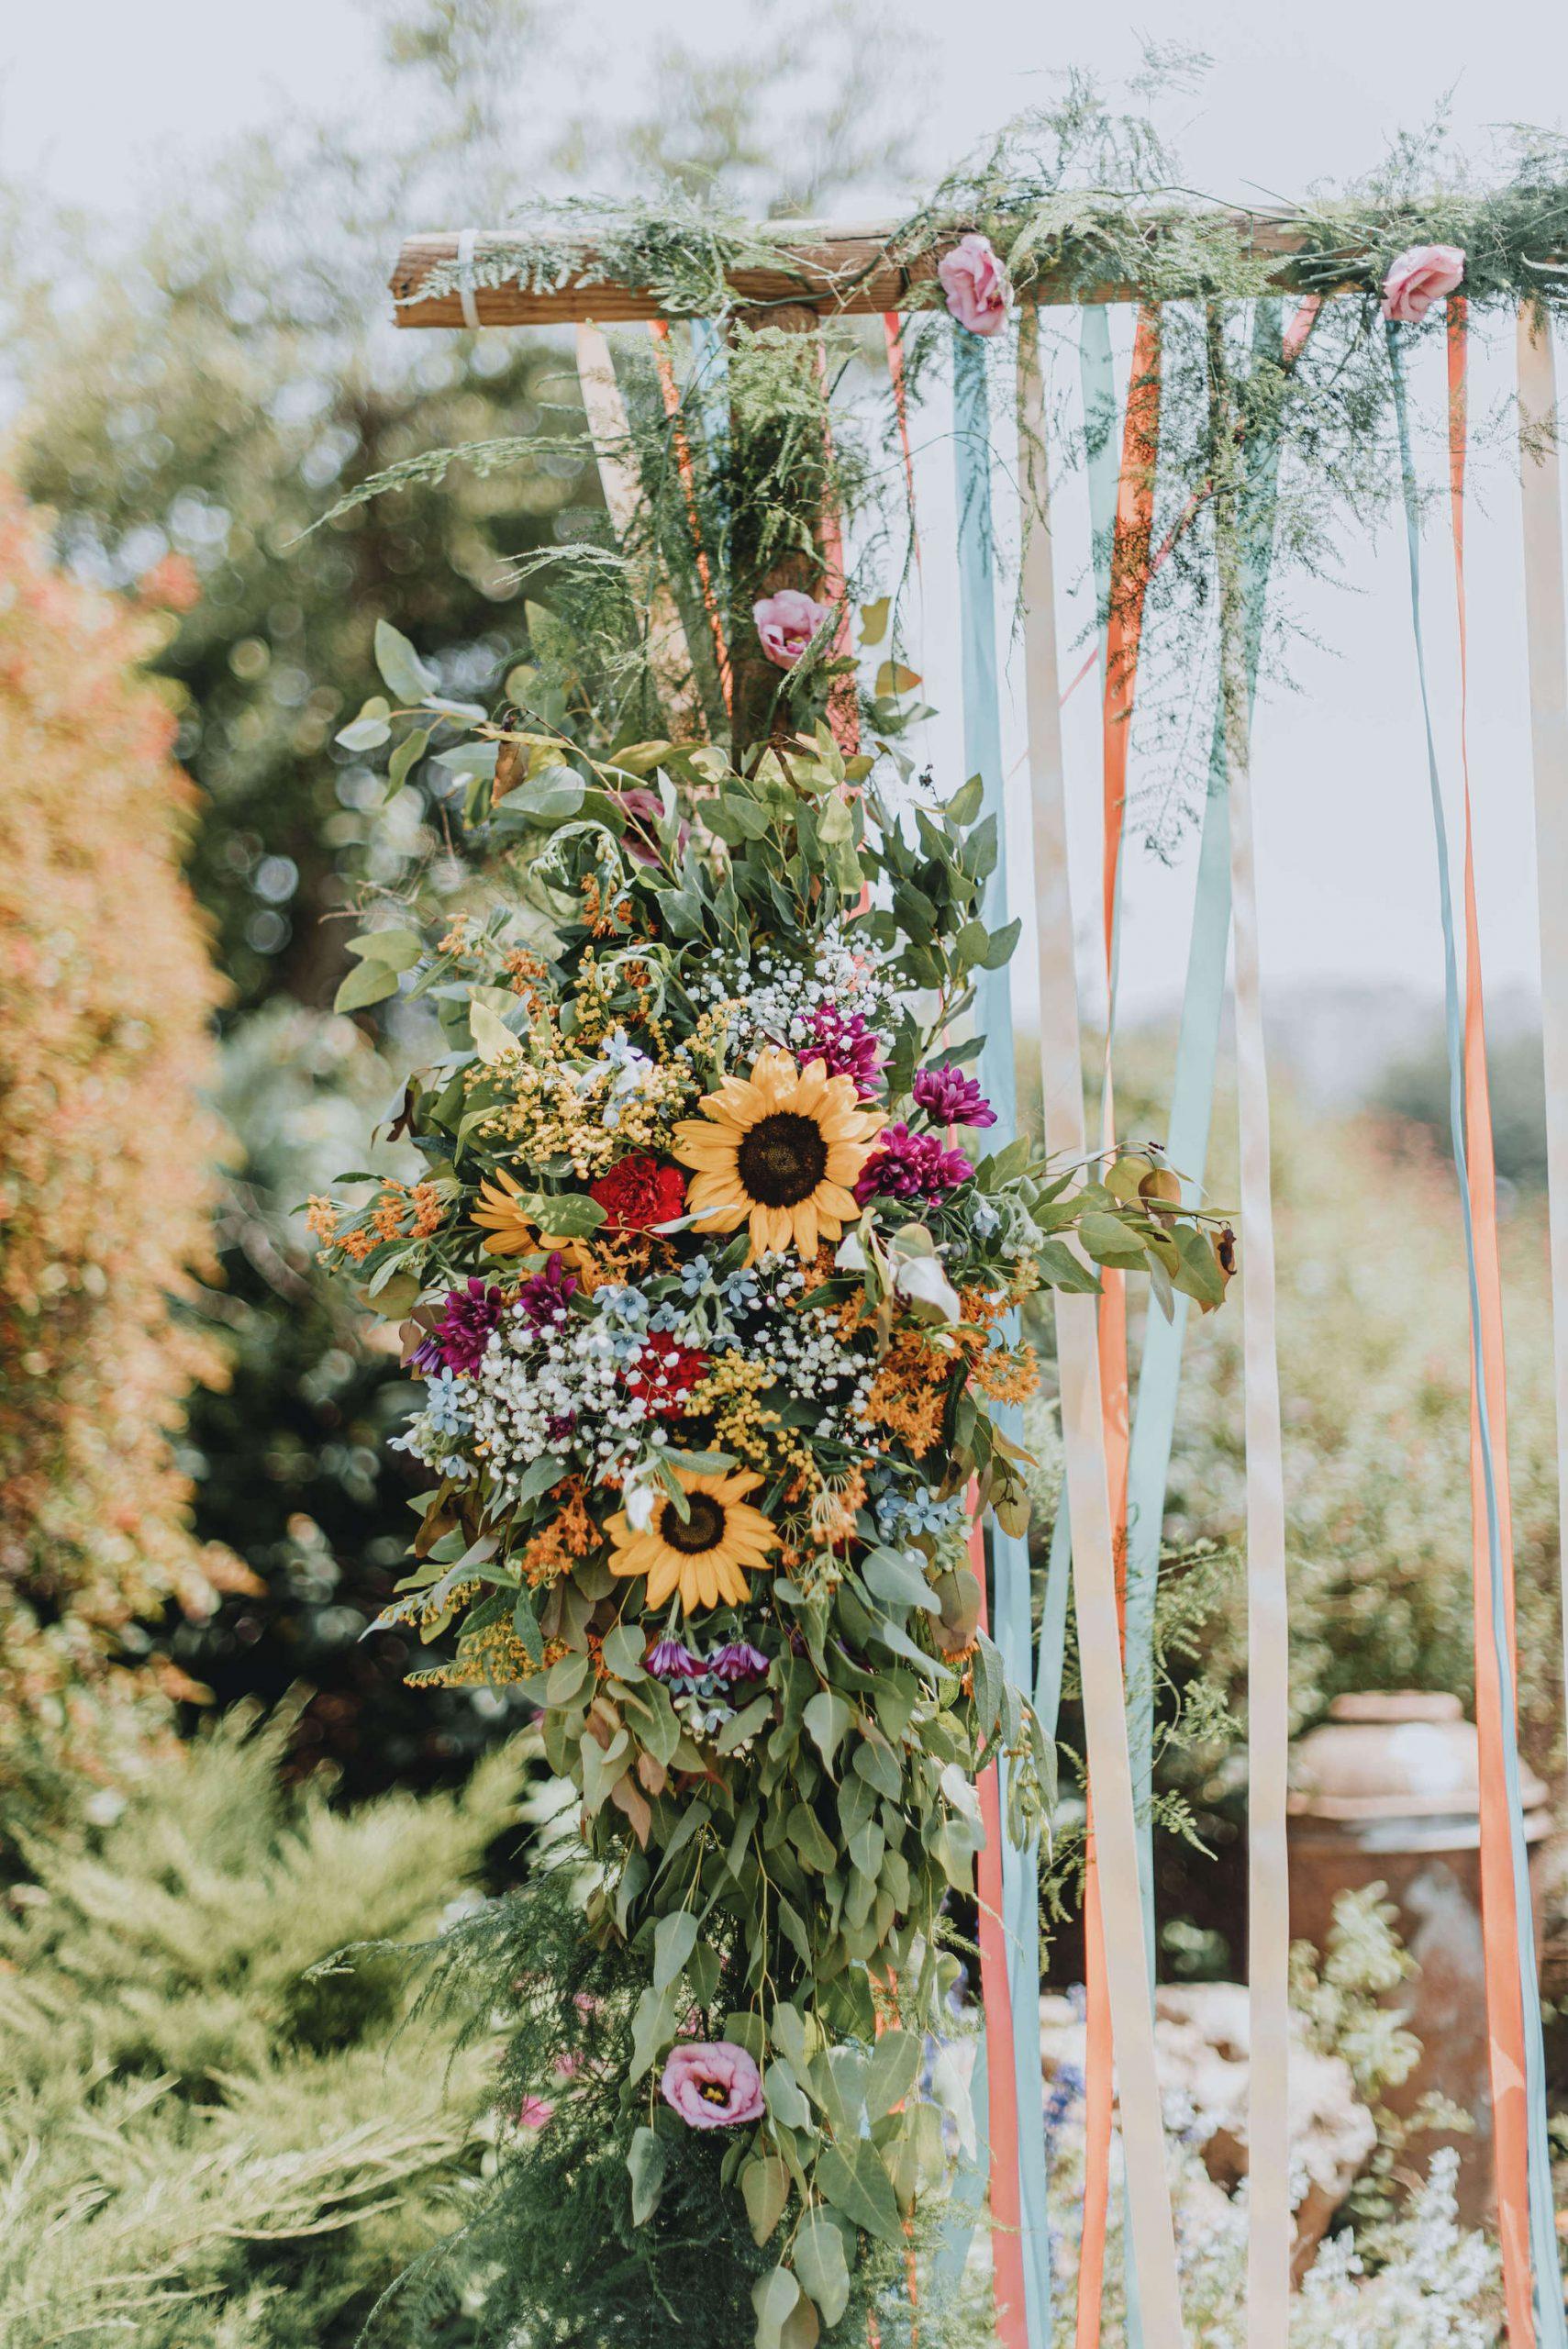 Brides Just Want to Have Fun: חתונת צהריים צבעונית ושמחה